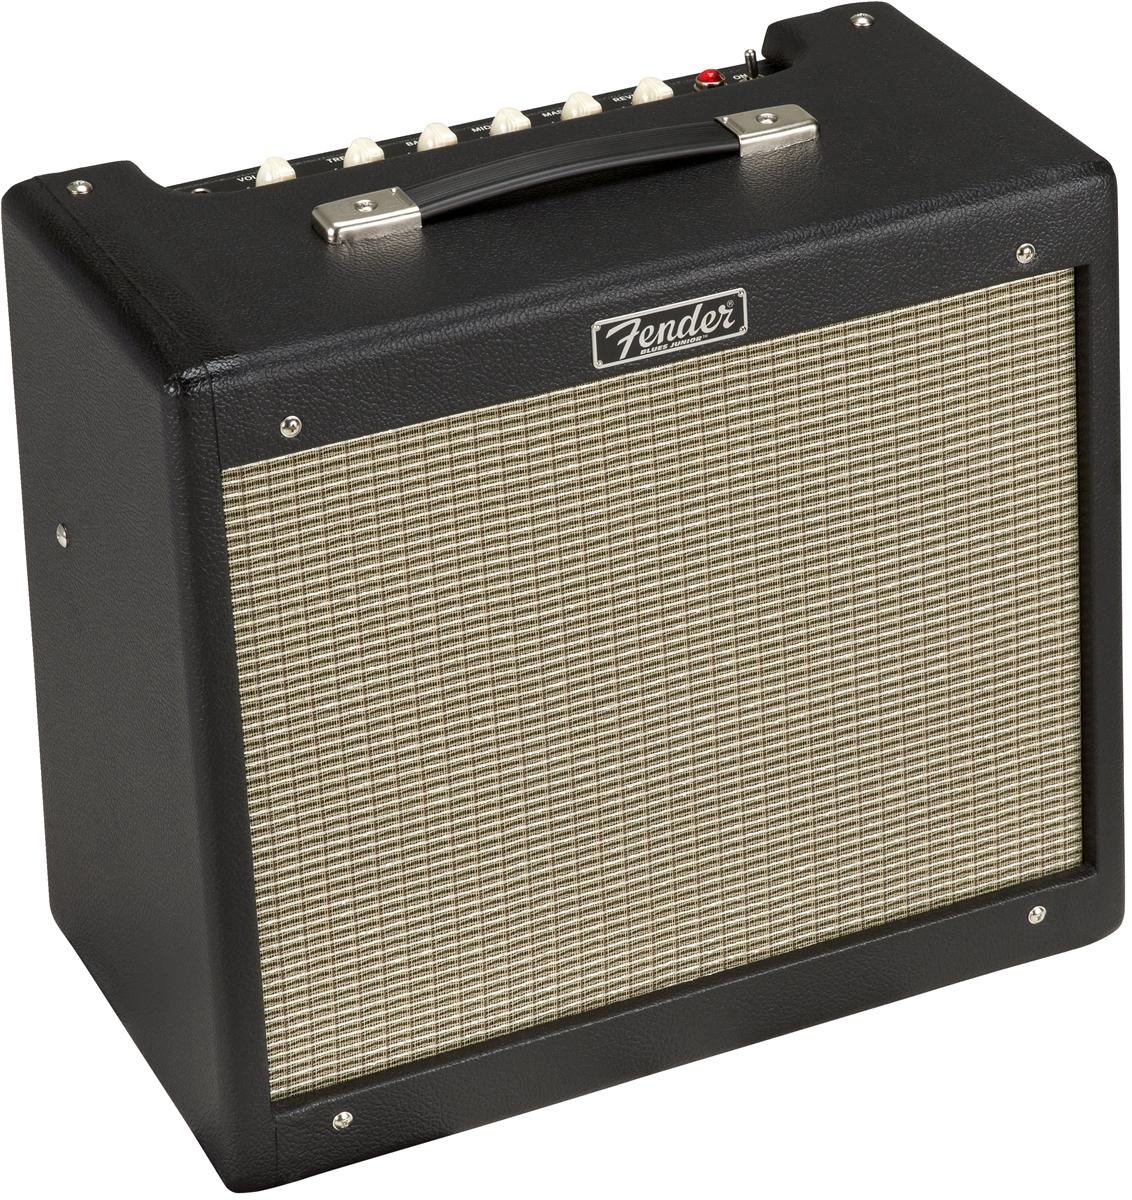 fender blues junior iv 15 watt 1x12 tube combo amp music machine nz. Black Bedroom Furniture Sets. Home Design Ideas